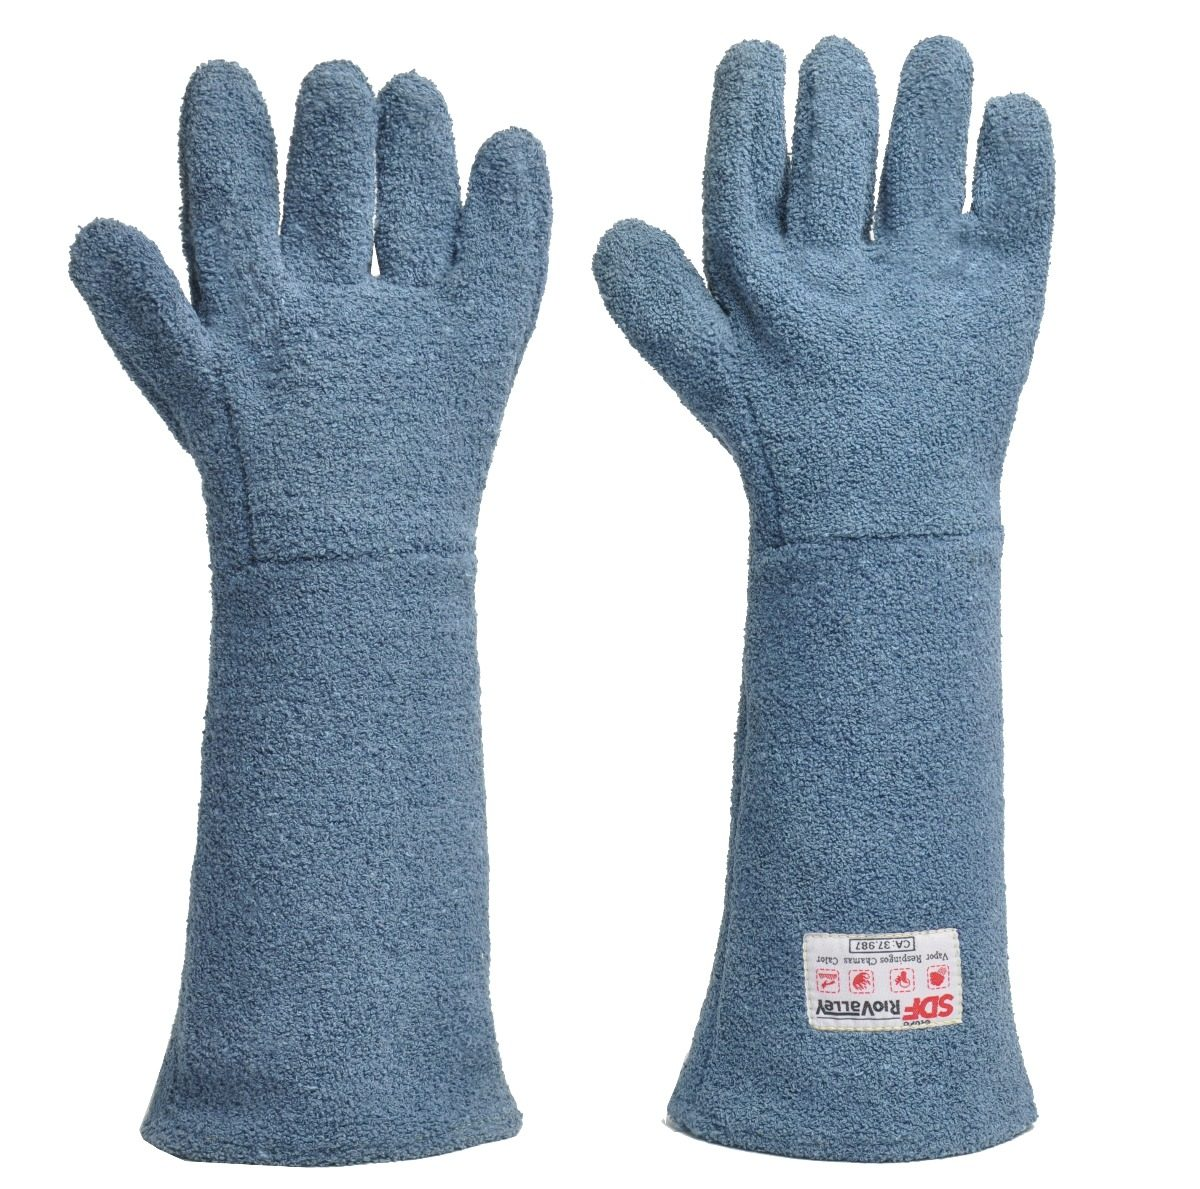 51f39fd9624b9 Luva Termica Para Cozinha Industrial – Cortina Cinza Para Cozinha